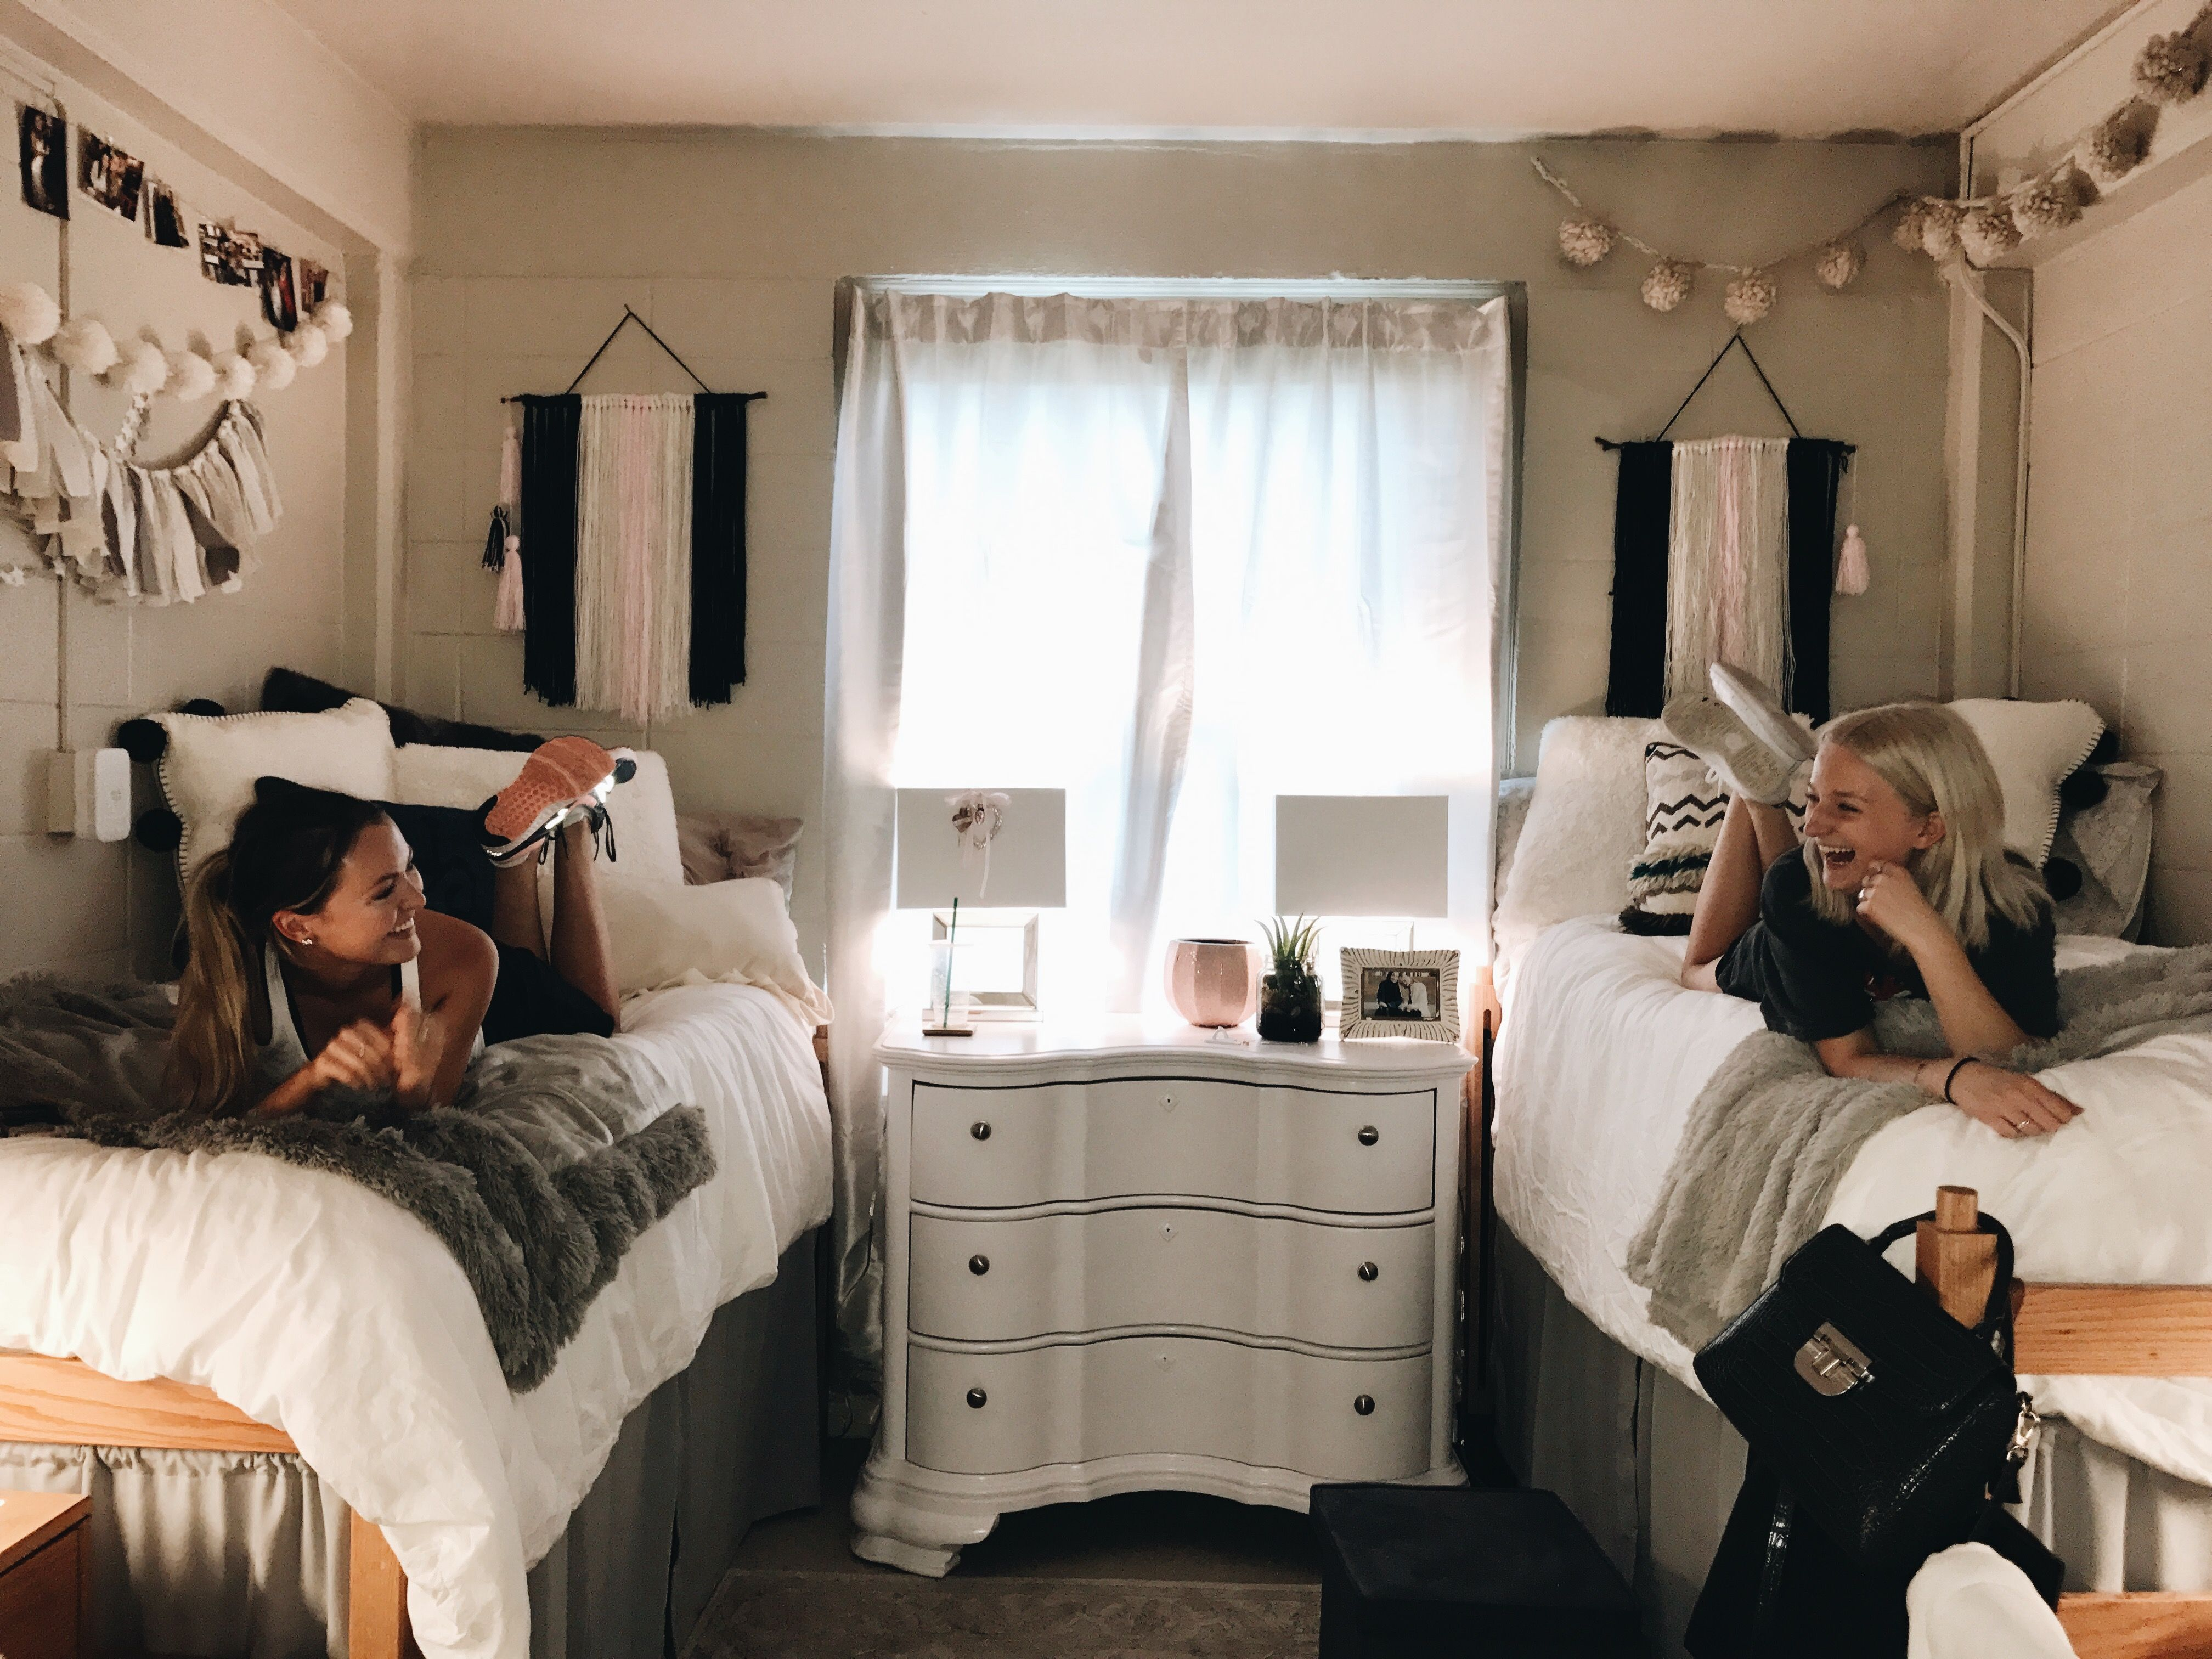 Samford University Dorm Room   College Dorm Ideas in 2019 ...